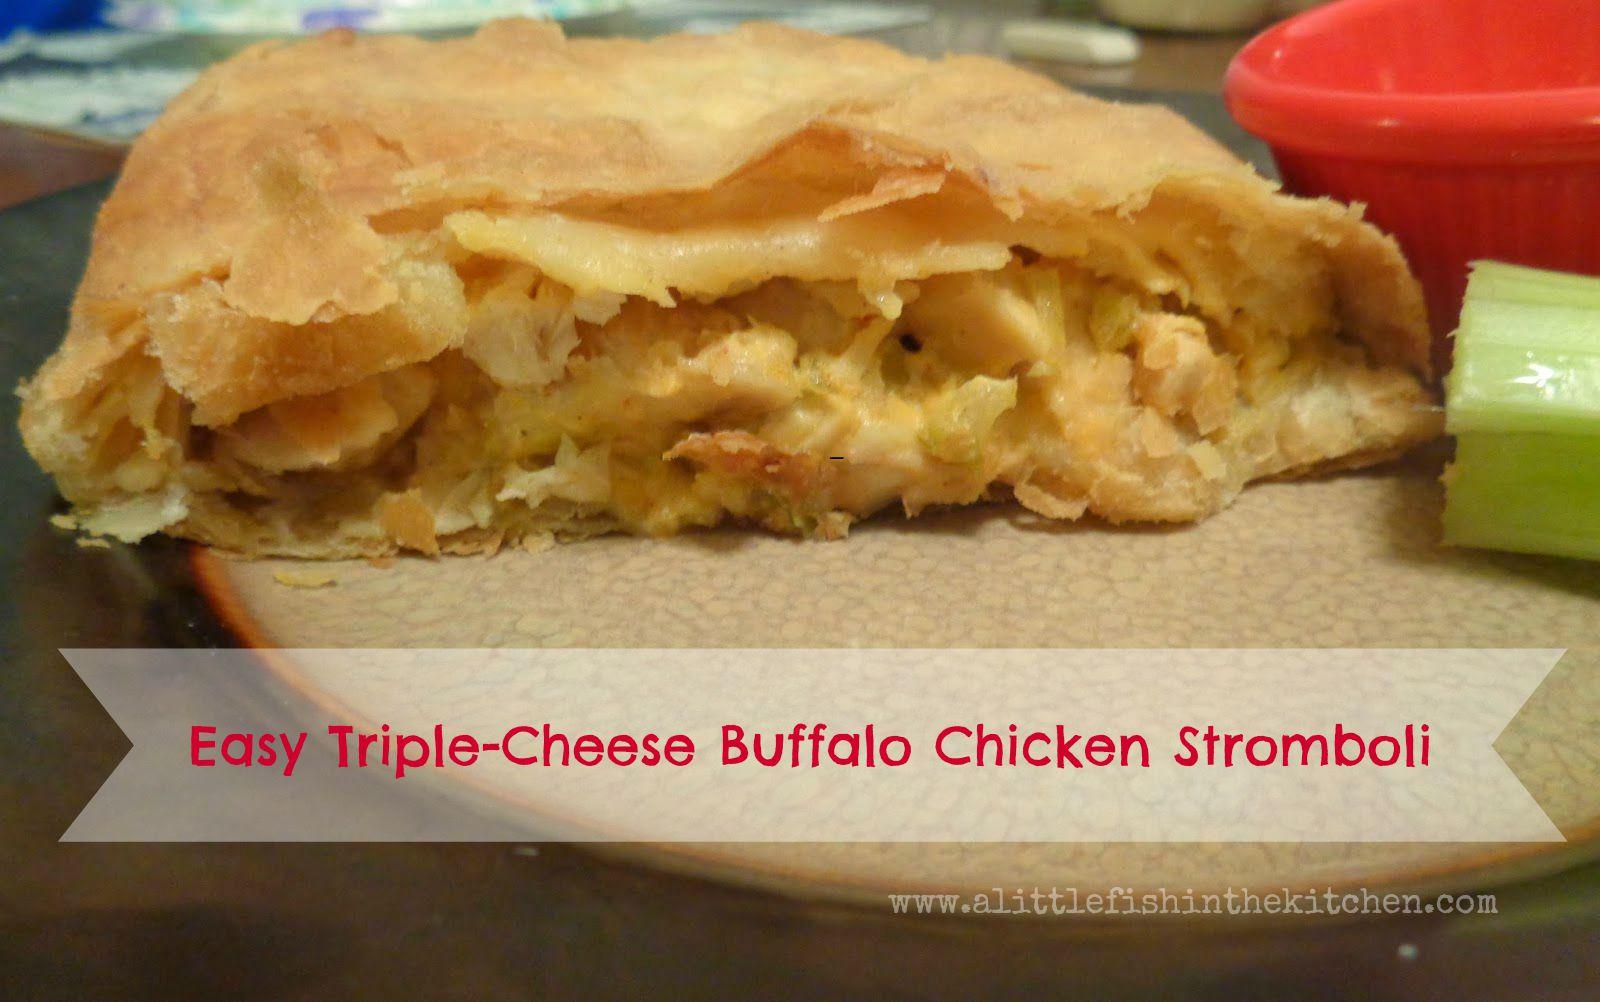 ... Fish in the Kitchen: Easy Triple-Cheese Buffalo Chicken Stromboli